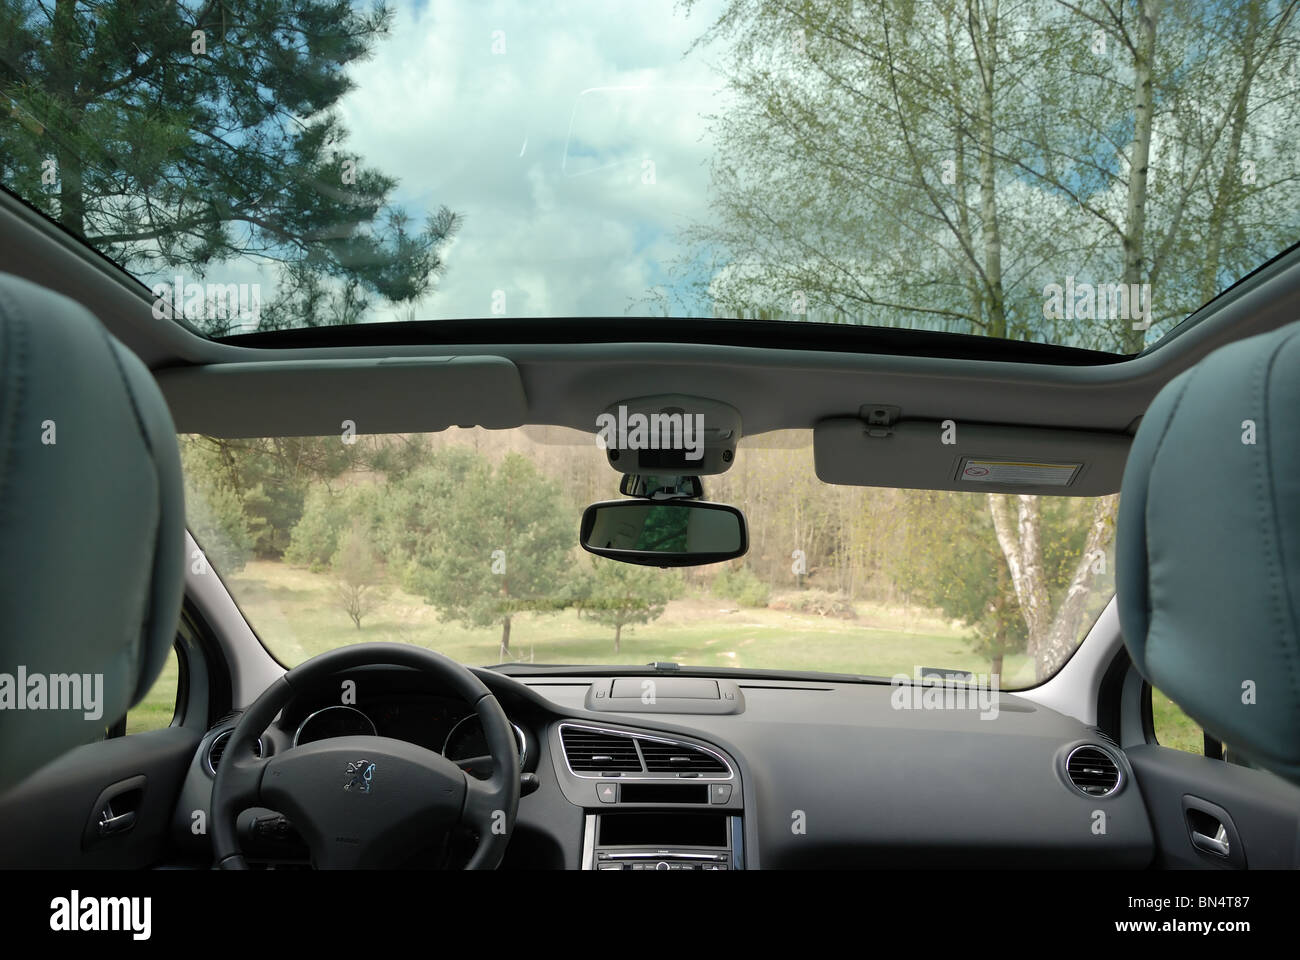 Peugeot 5008 - MPV, van - interior - panoramic glass sunroof, dashboard, cockpit - Stock Image